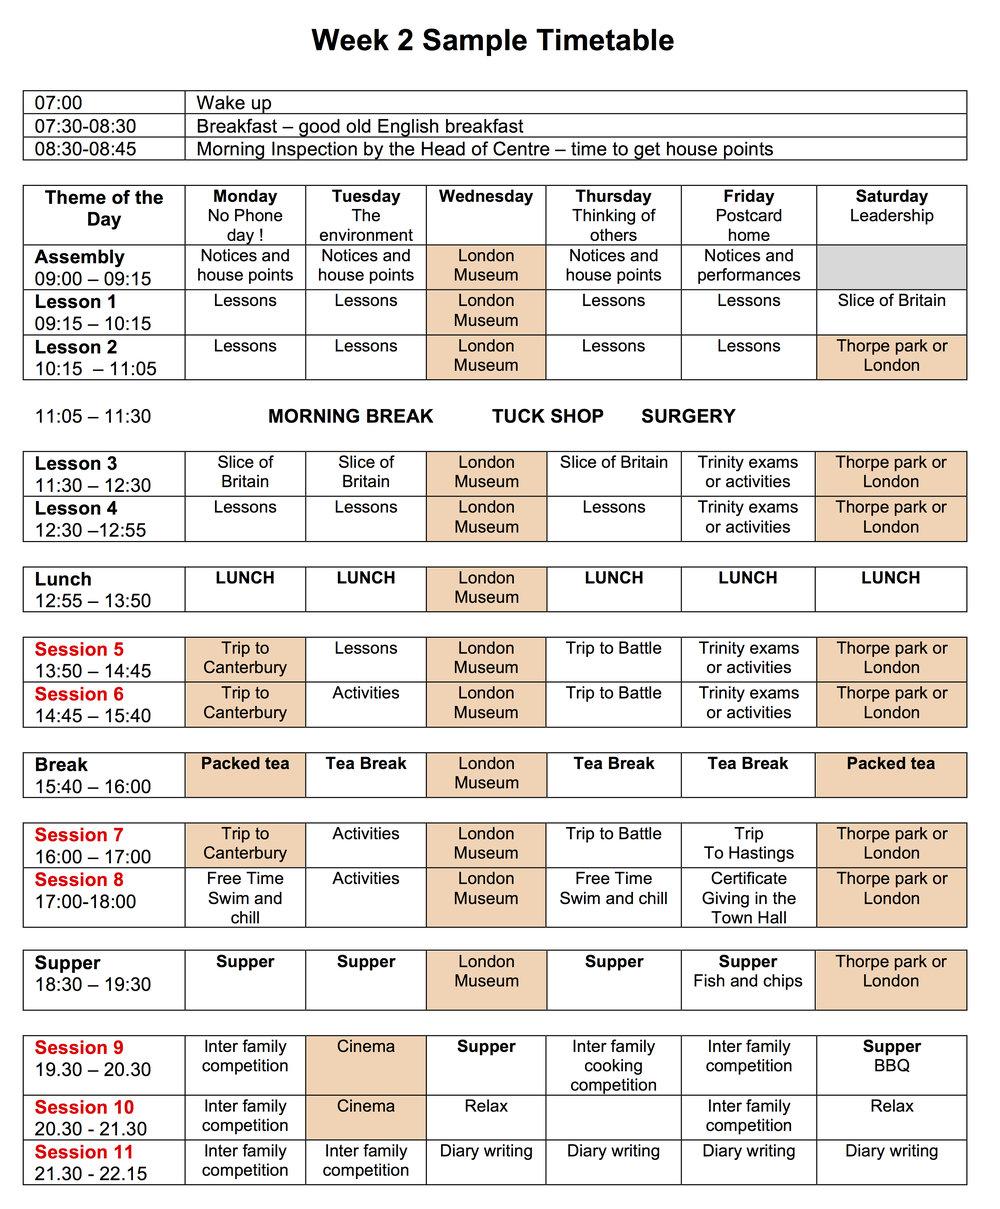 BSTG summer school timetable  (dragged) 1.jpg